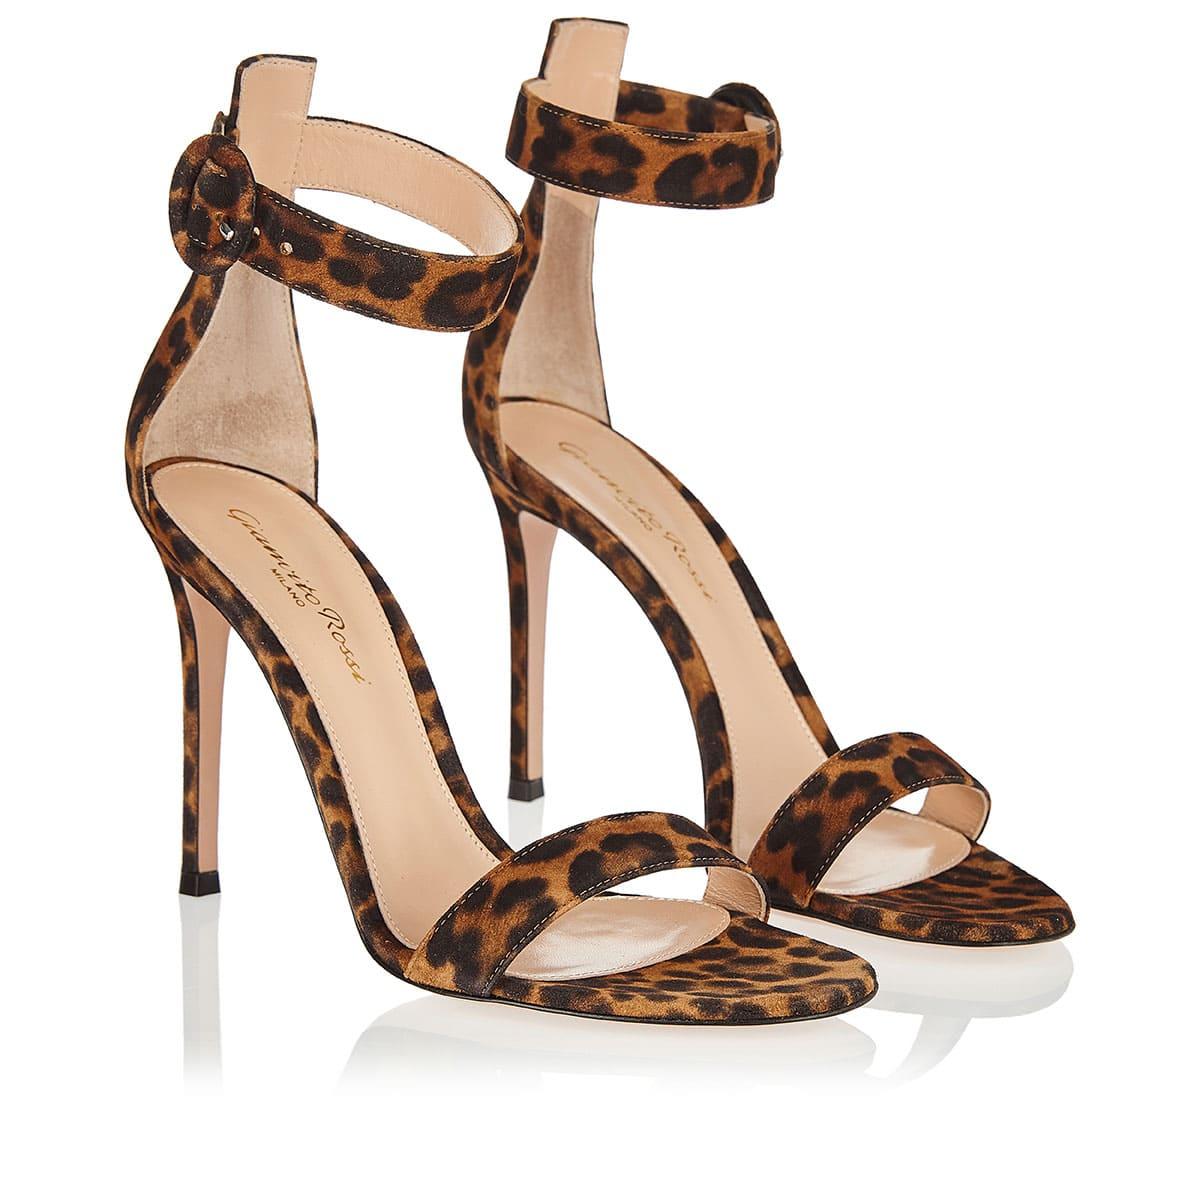 Portofino 105 leopard suede sandals